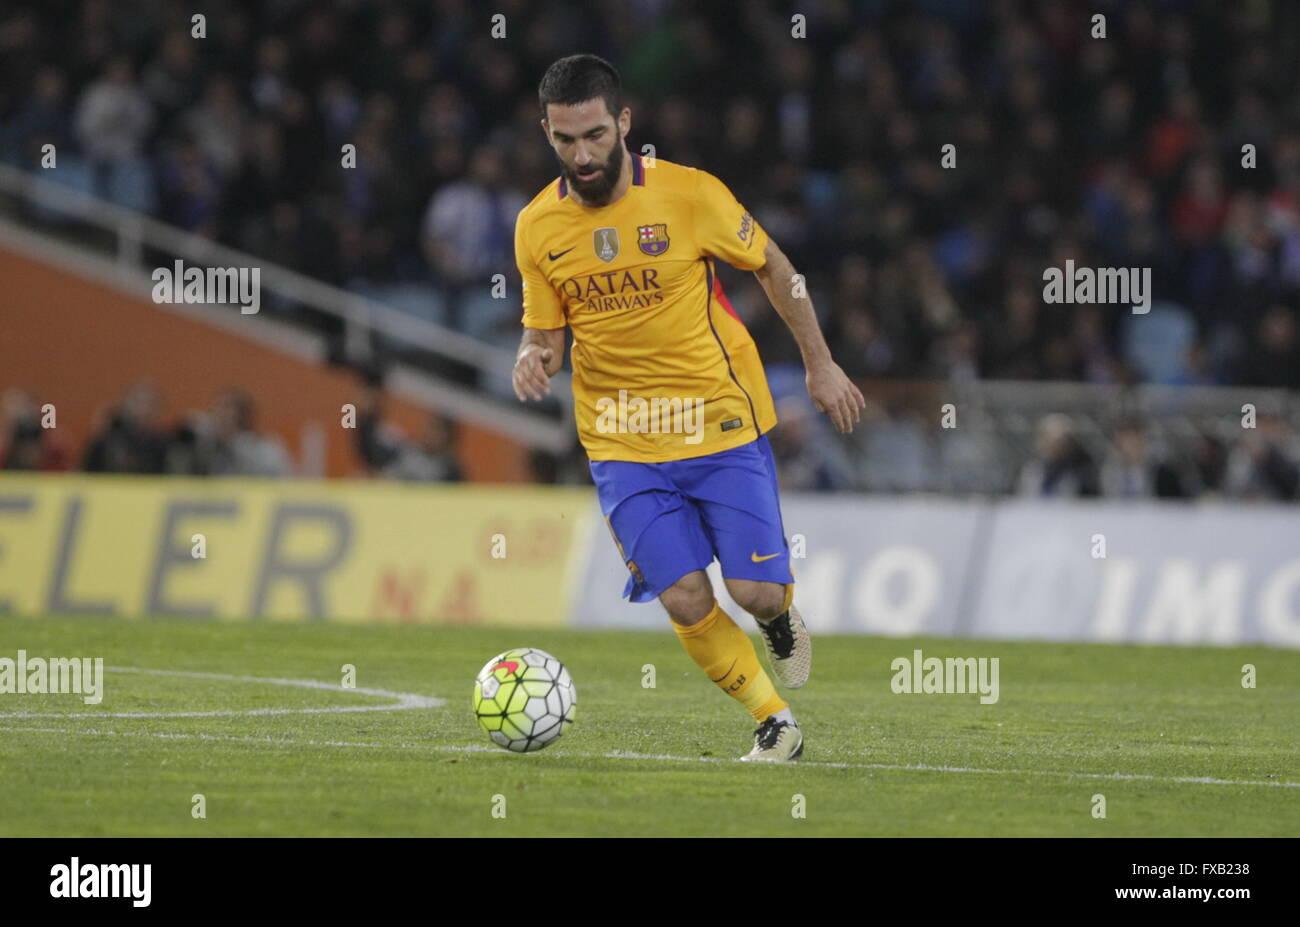 Arda Turan Barcelona in action during the La Liga match espagolde Real Sociedad - FC Barcelona at Anoeta Stadium - Stock Image